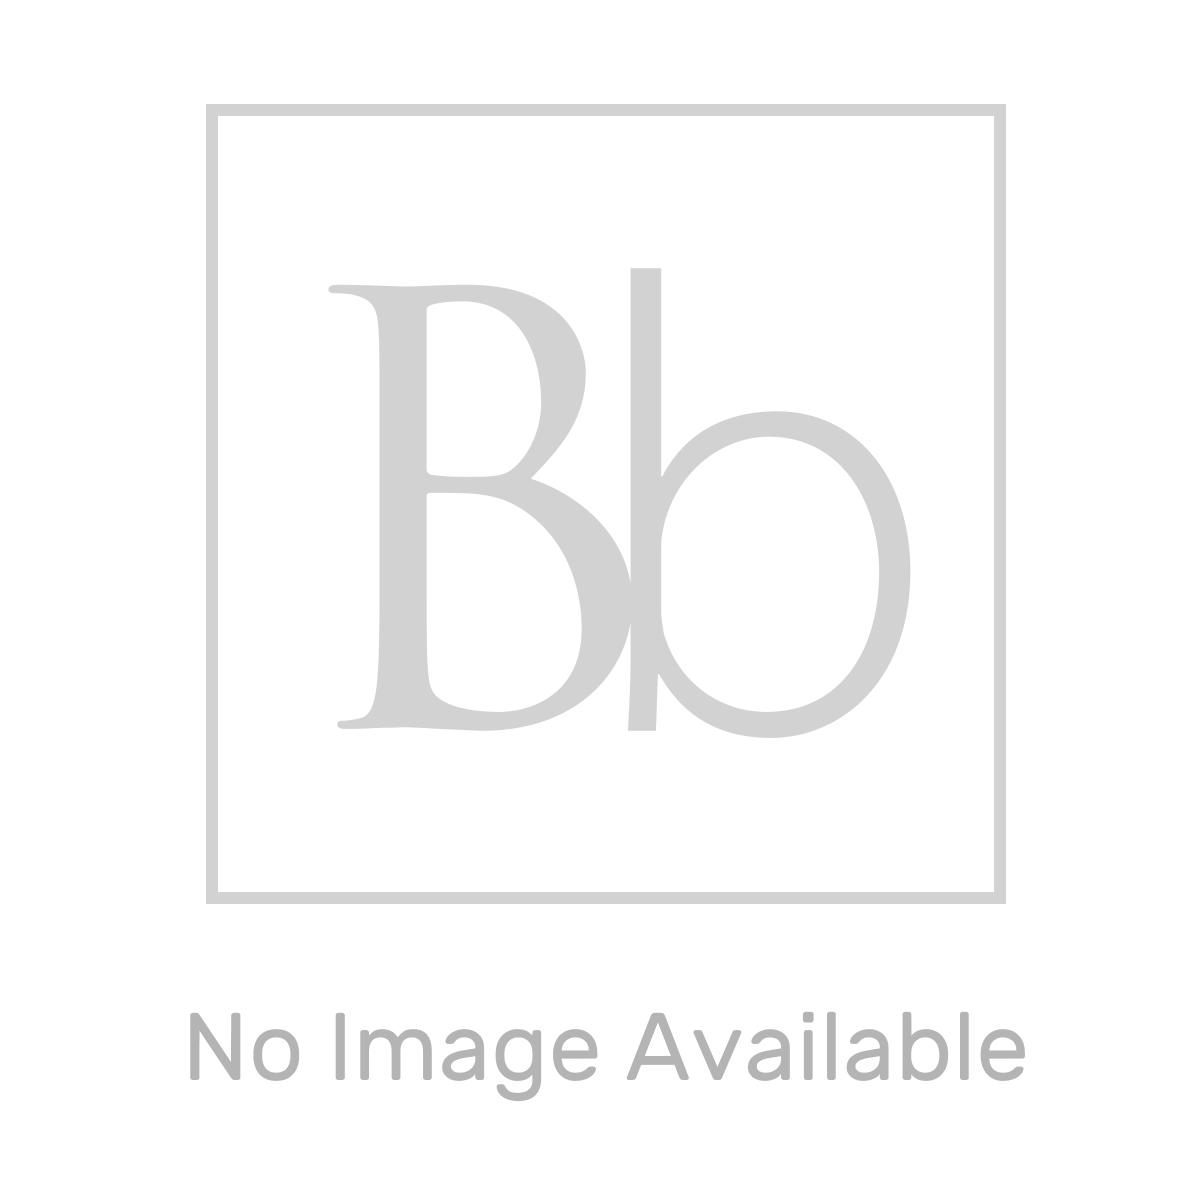 RAK Series 600 Back To Wall Toilet and 500 Series Mini Medium Oak Double Door Vanity Unit